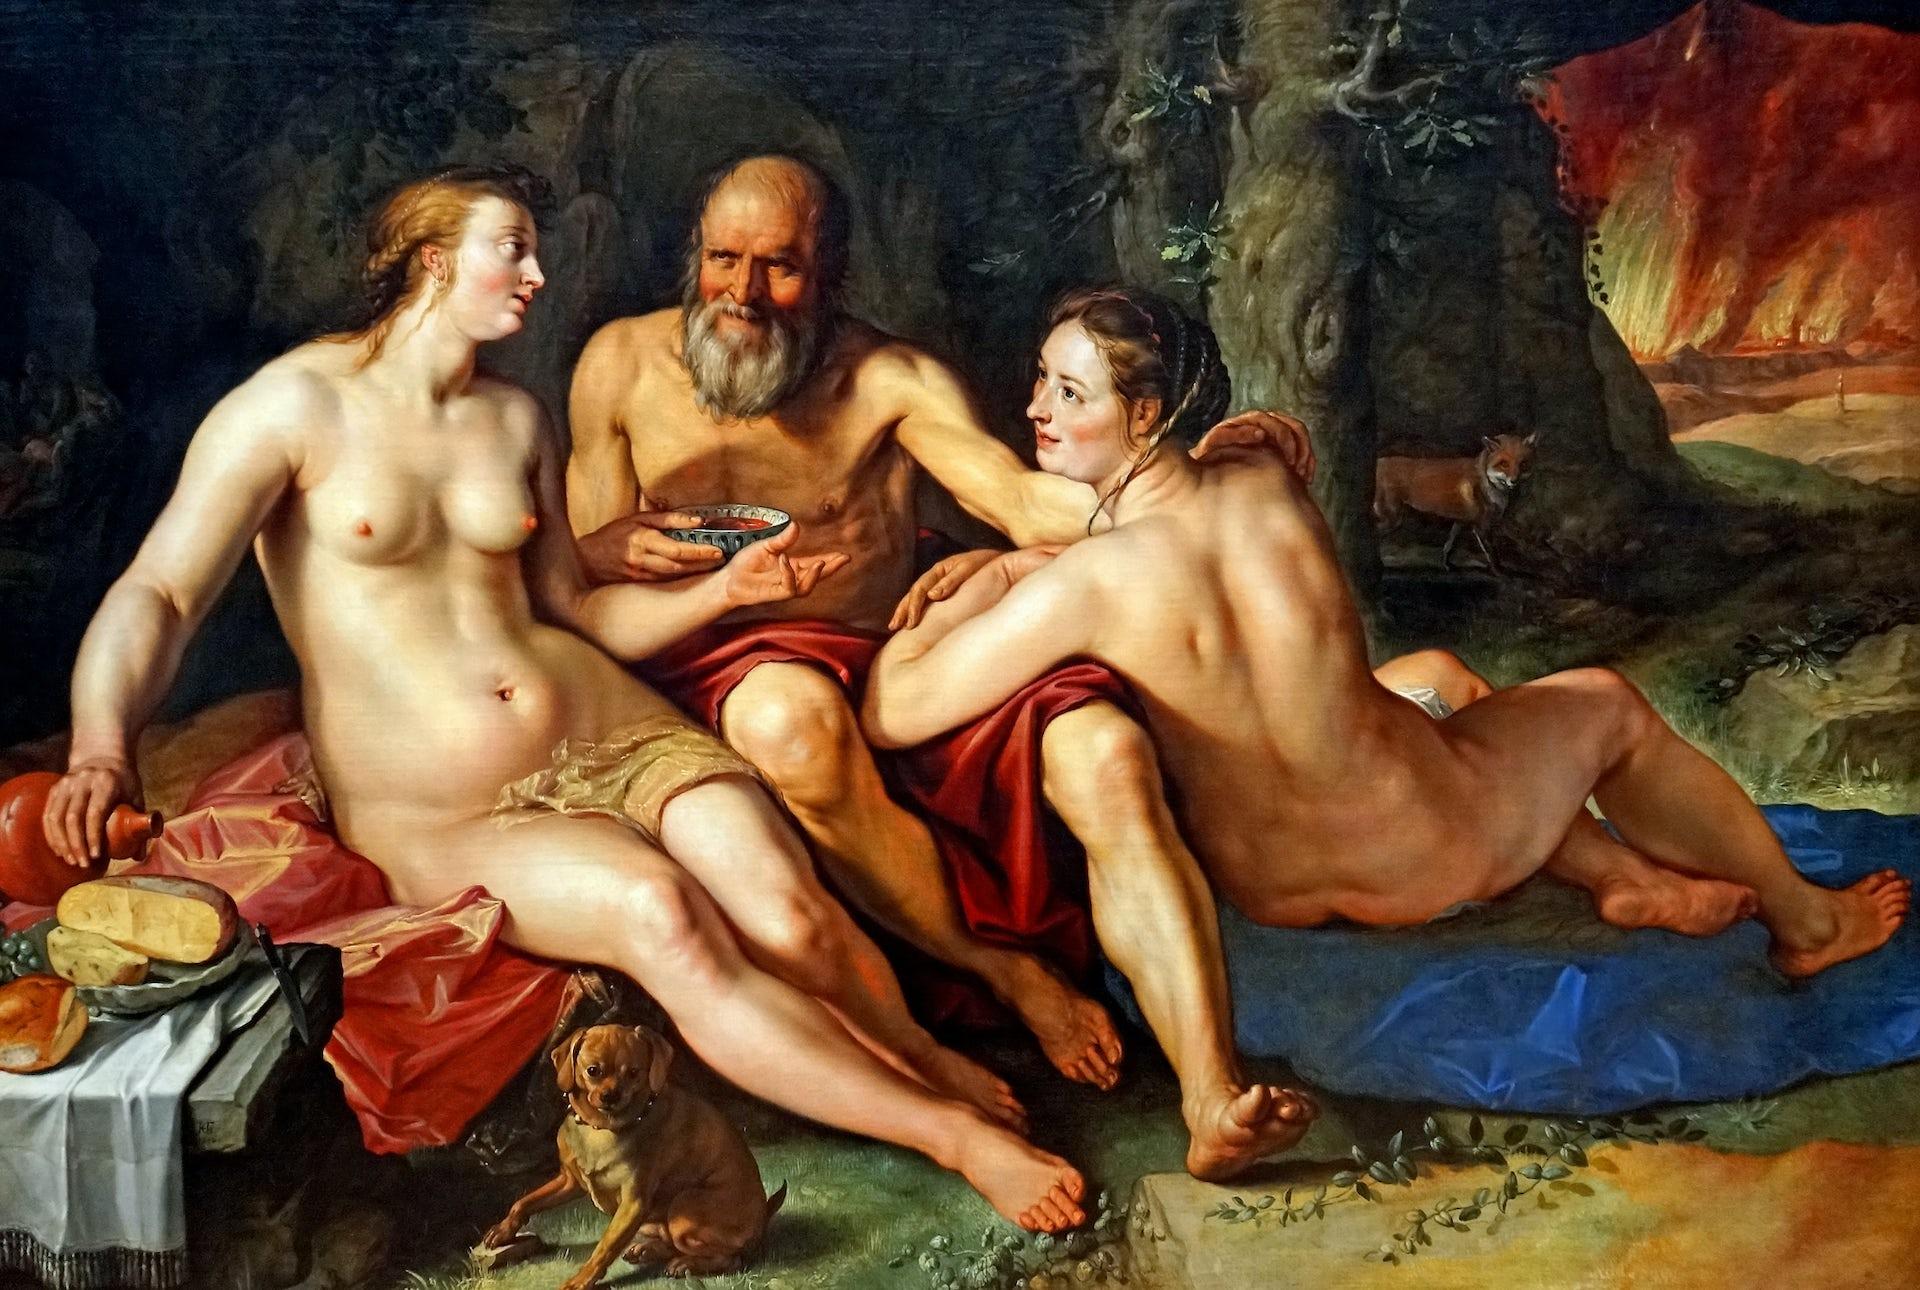 Loira casada da barra da tijuca adora se exibir XXX